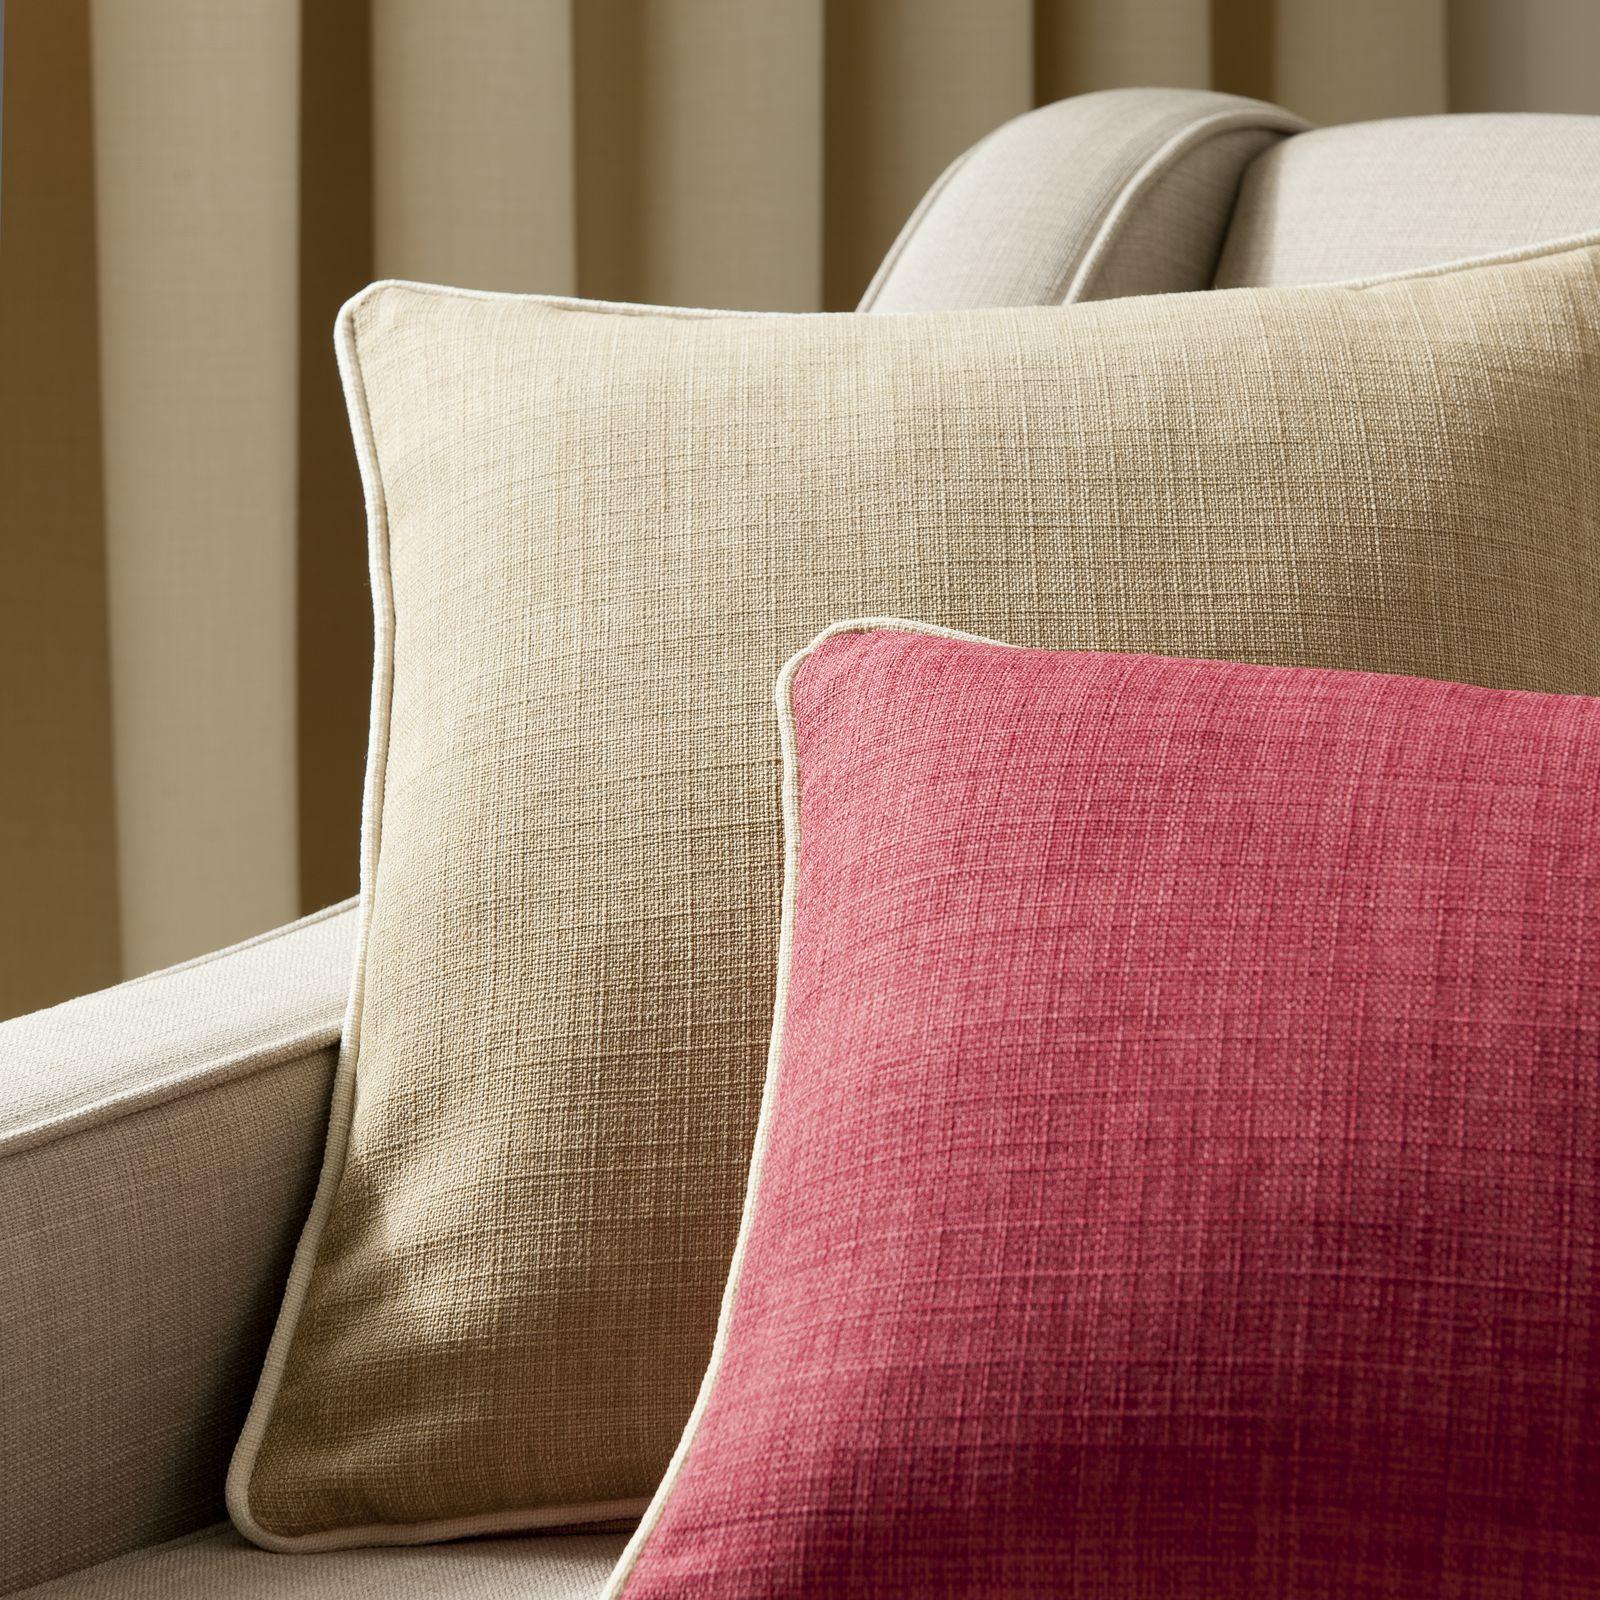 2Linoso cushions photoshoot.jpg